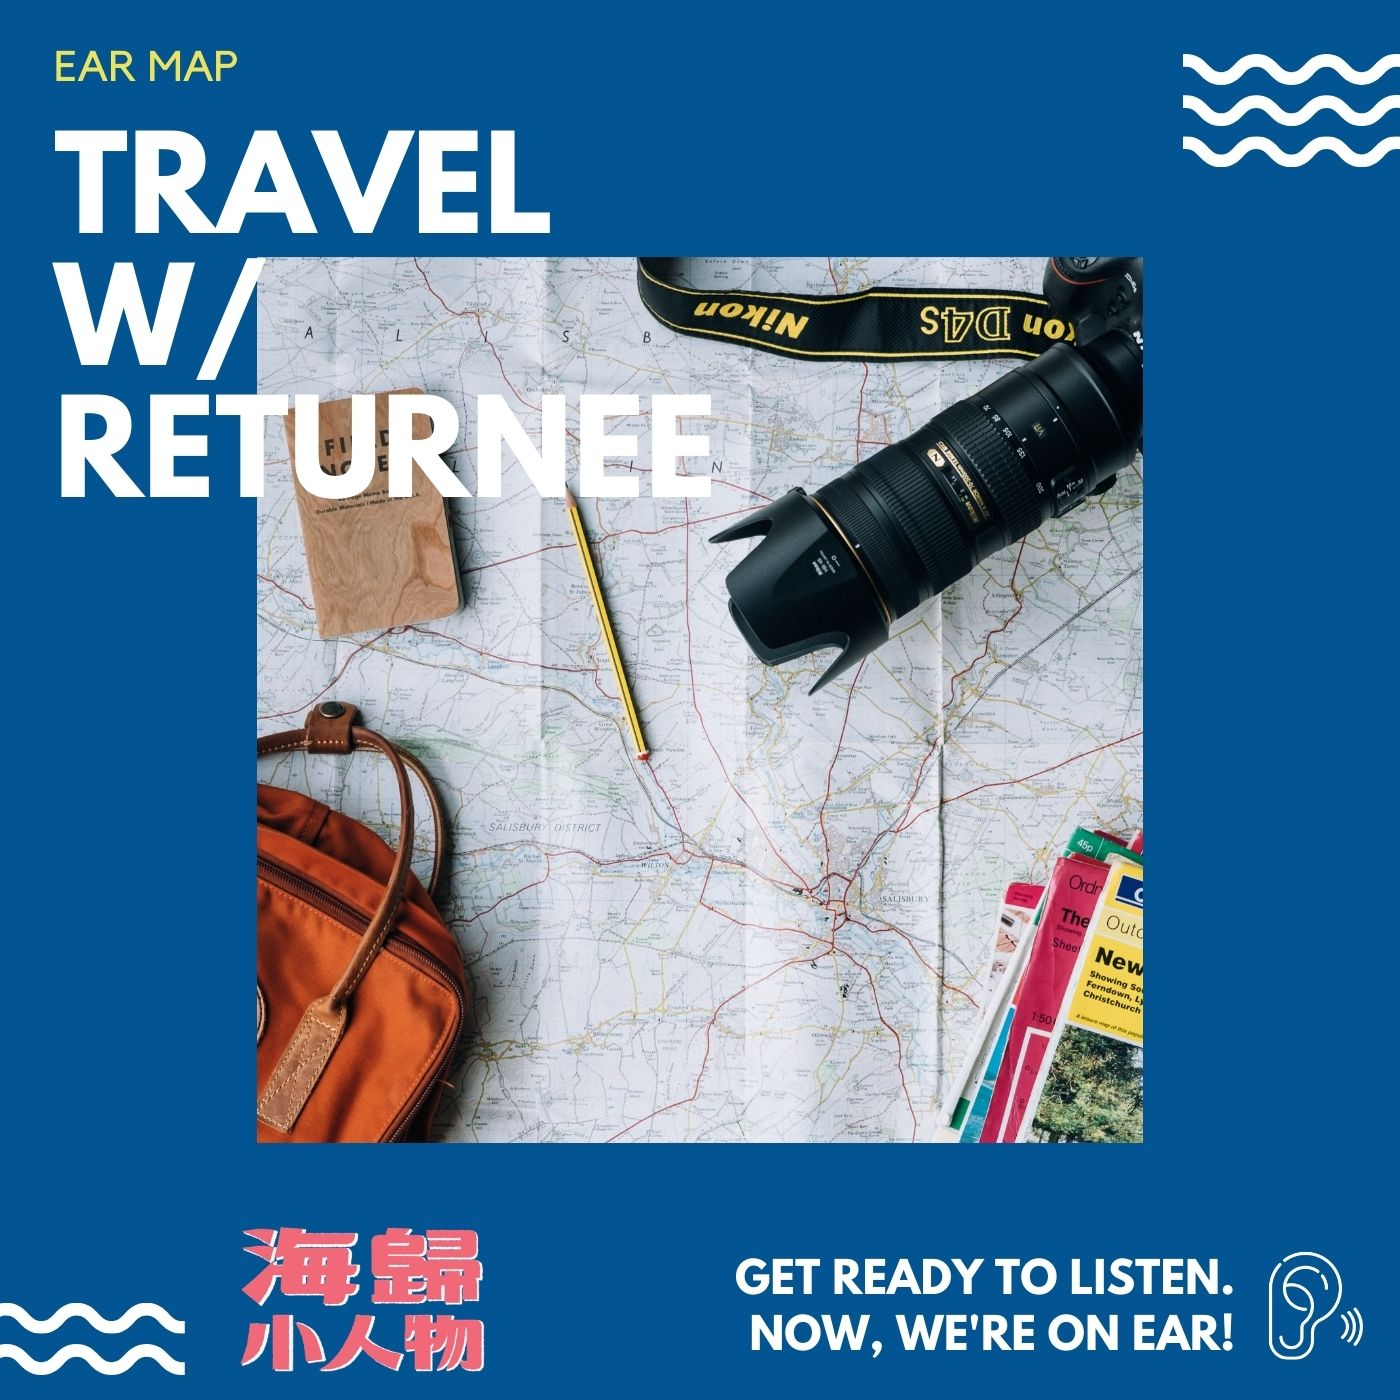 EP11. 【充滿夢想與魔法的城市-奧蘭多遊樂園之都】耳朵旅遊單元:跟著海歸遊玩世界吧!